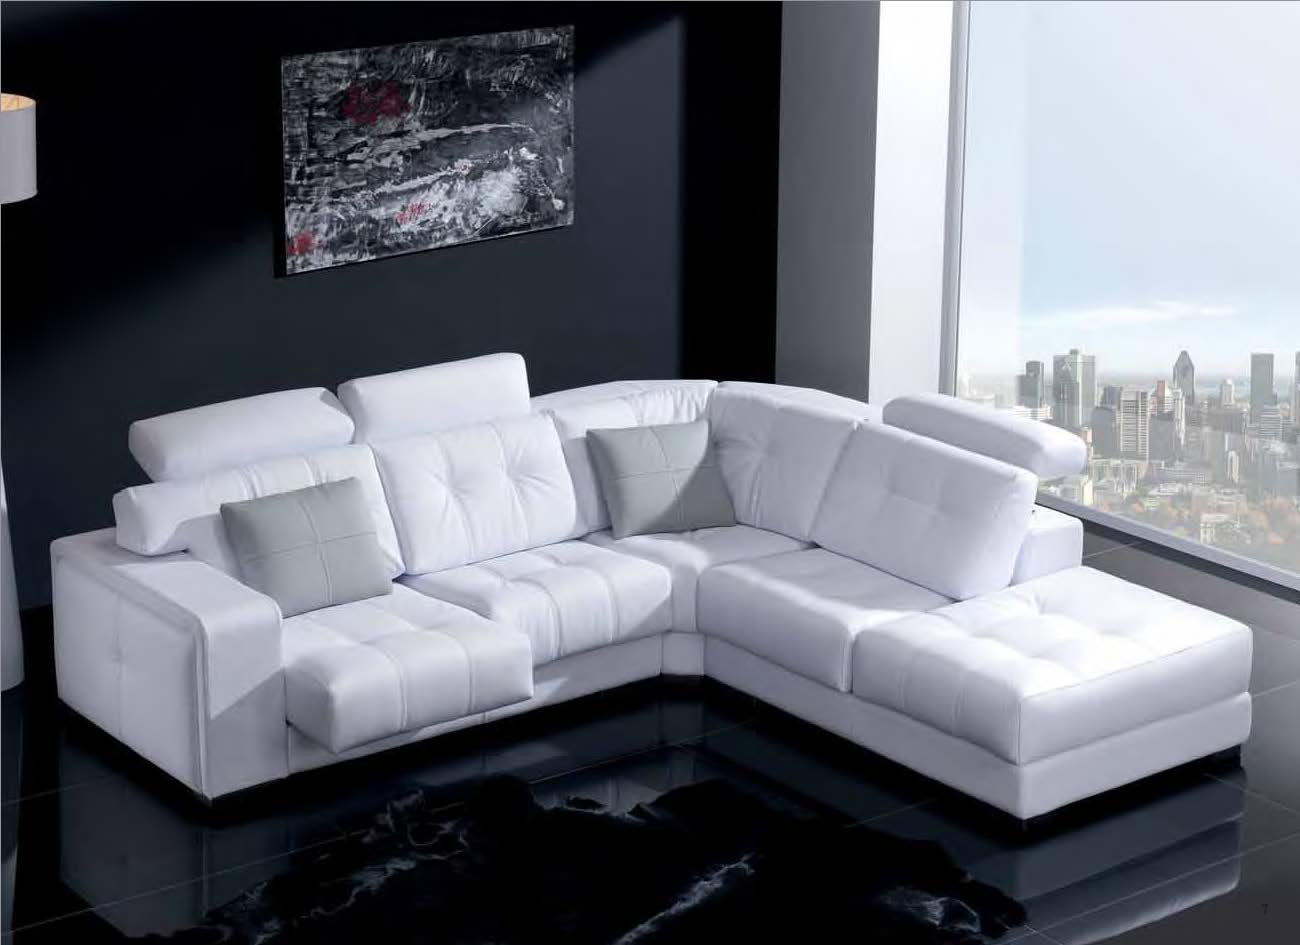 Hermes vym modern living room spain collections for Modern living room furniture nj